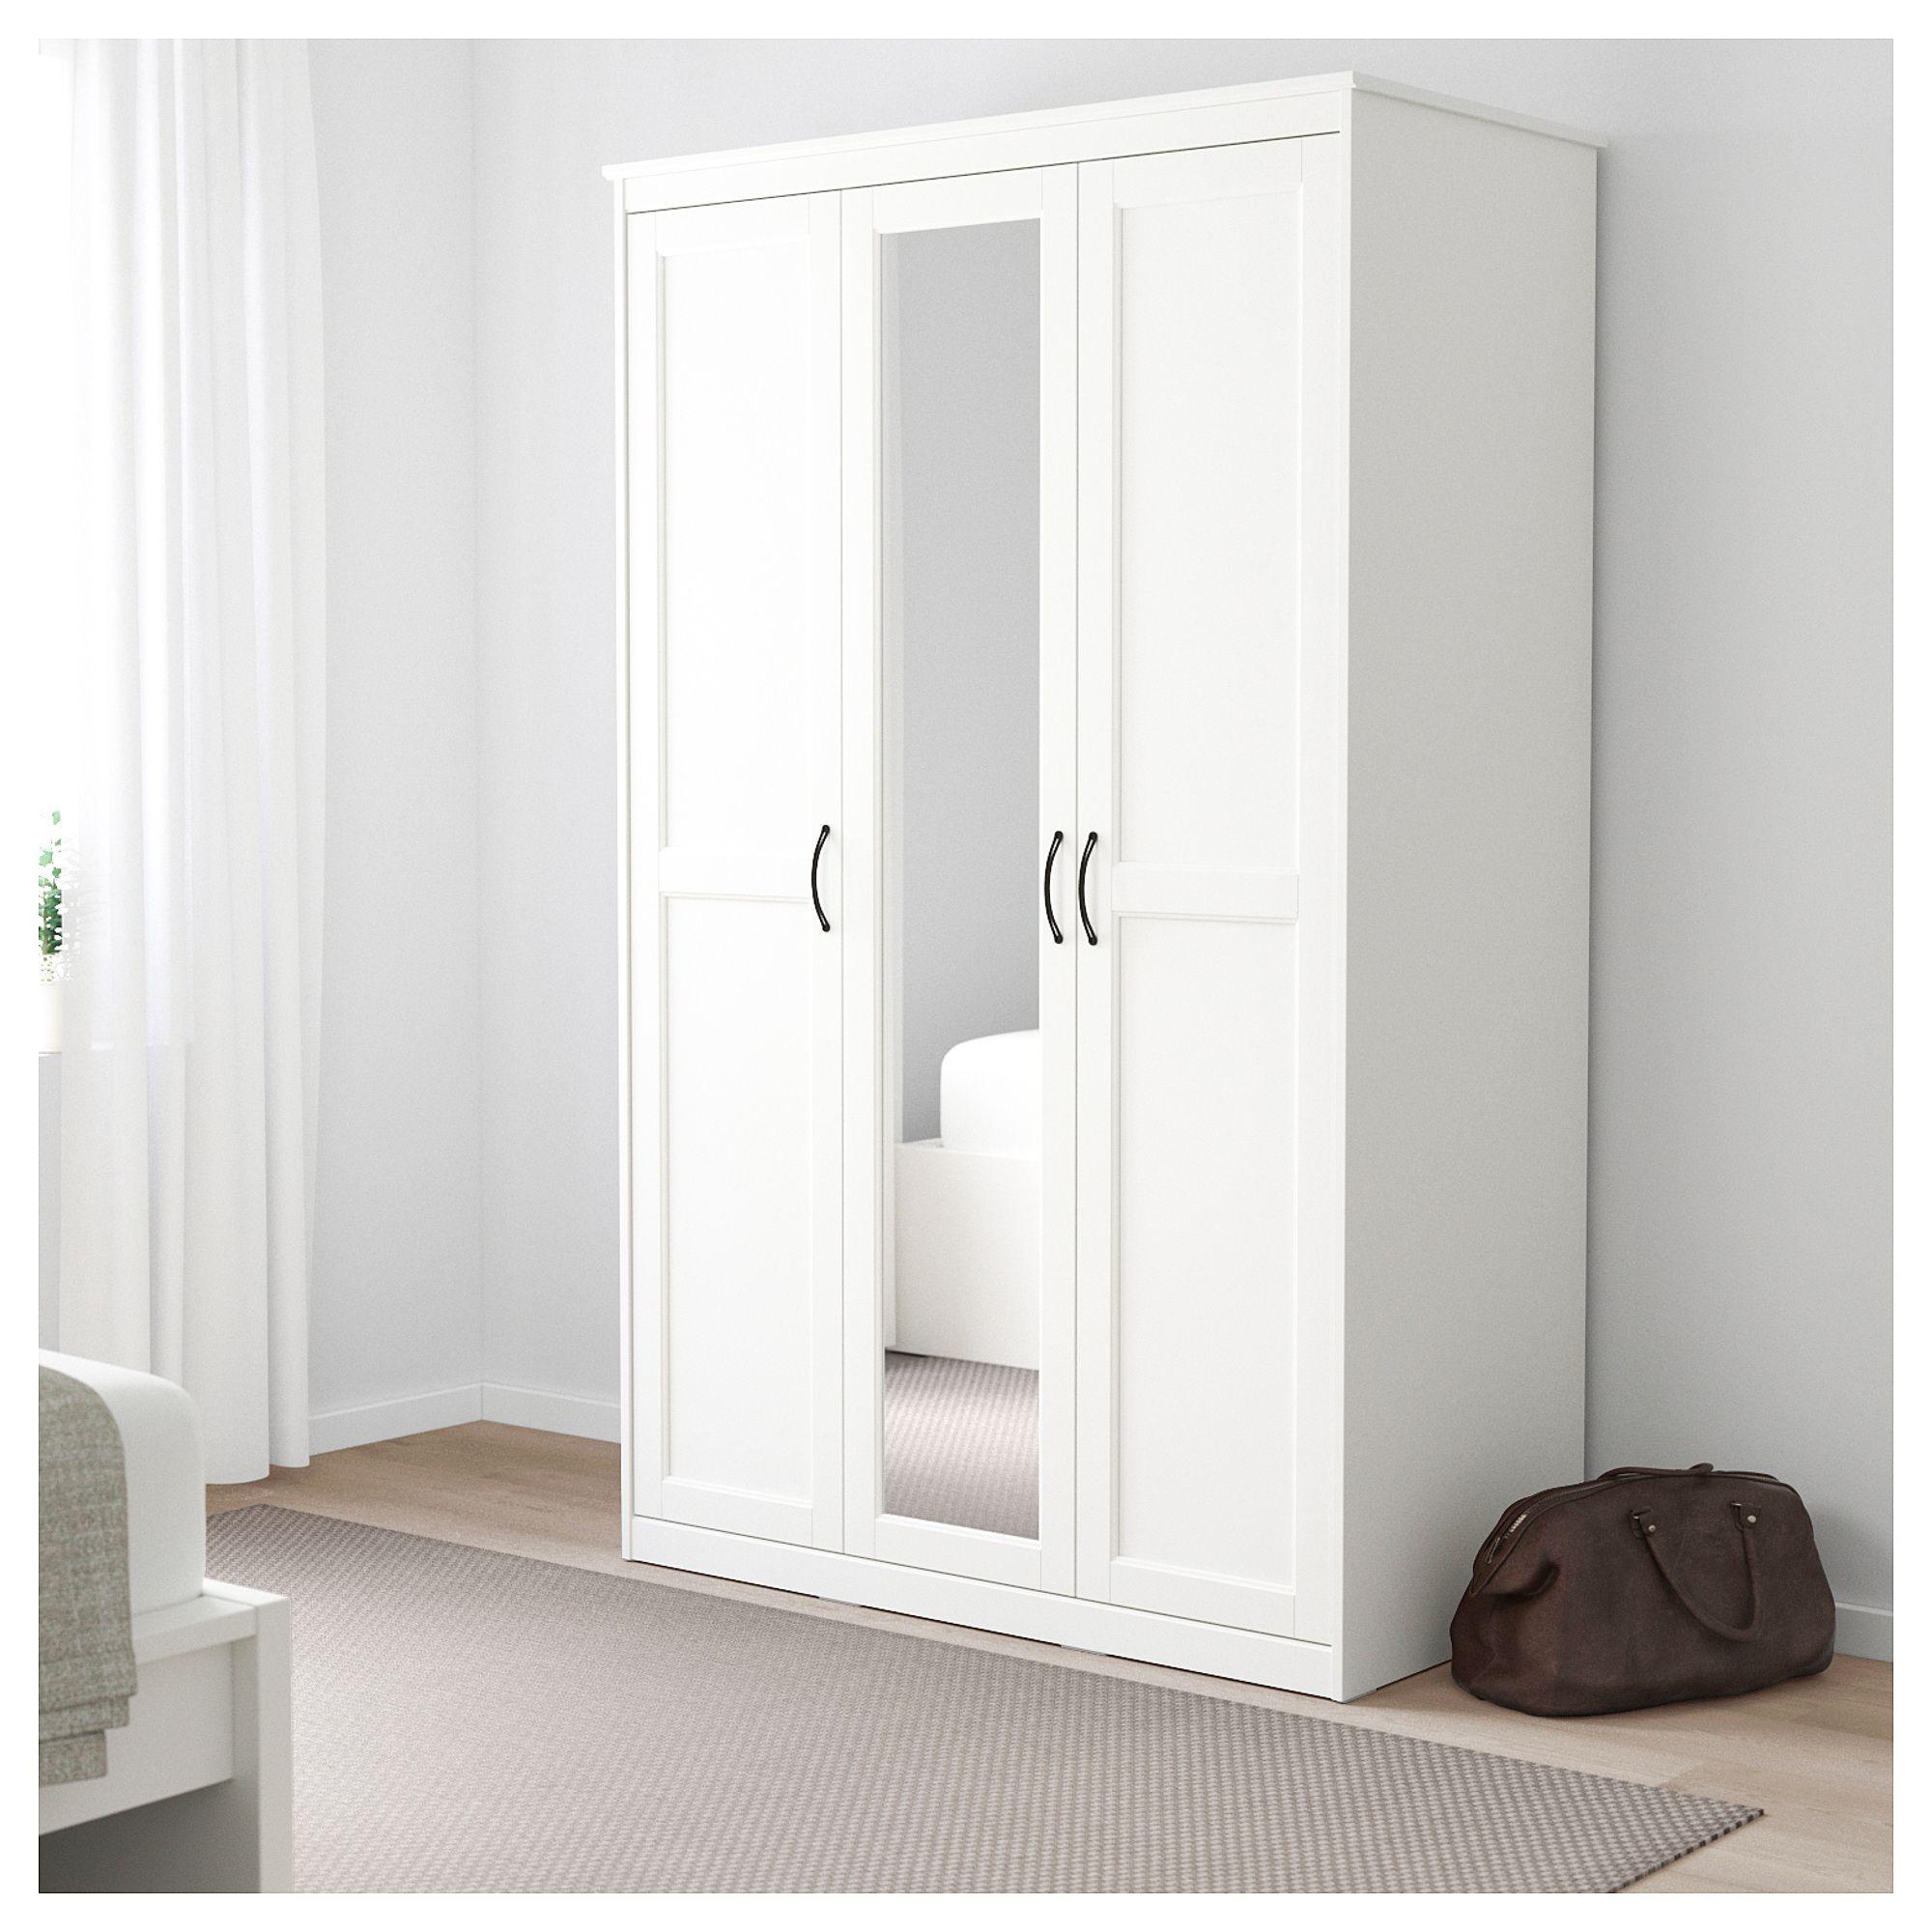 Songesand Wardrobe White 47 1 8x23 5 8x75 1 4 Ikea Wardrobe